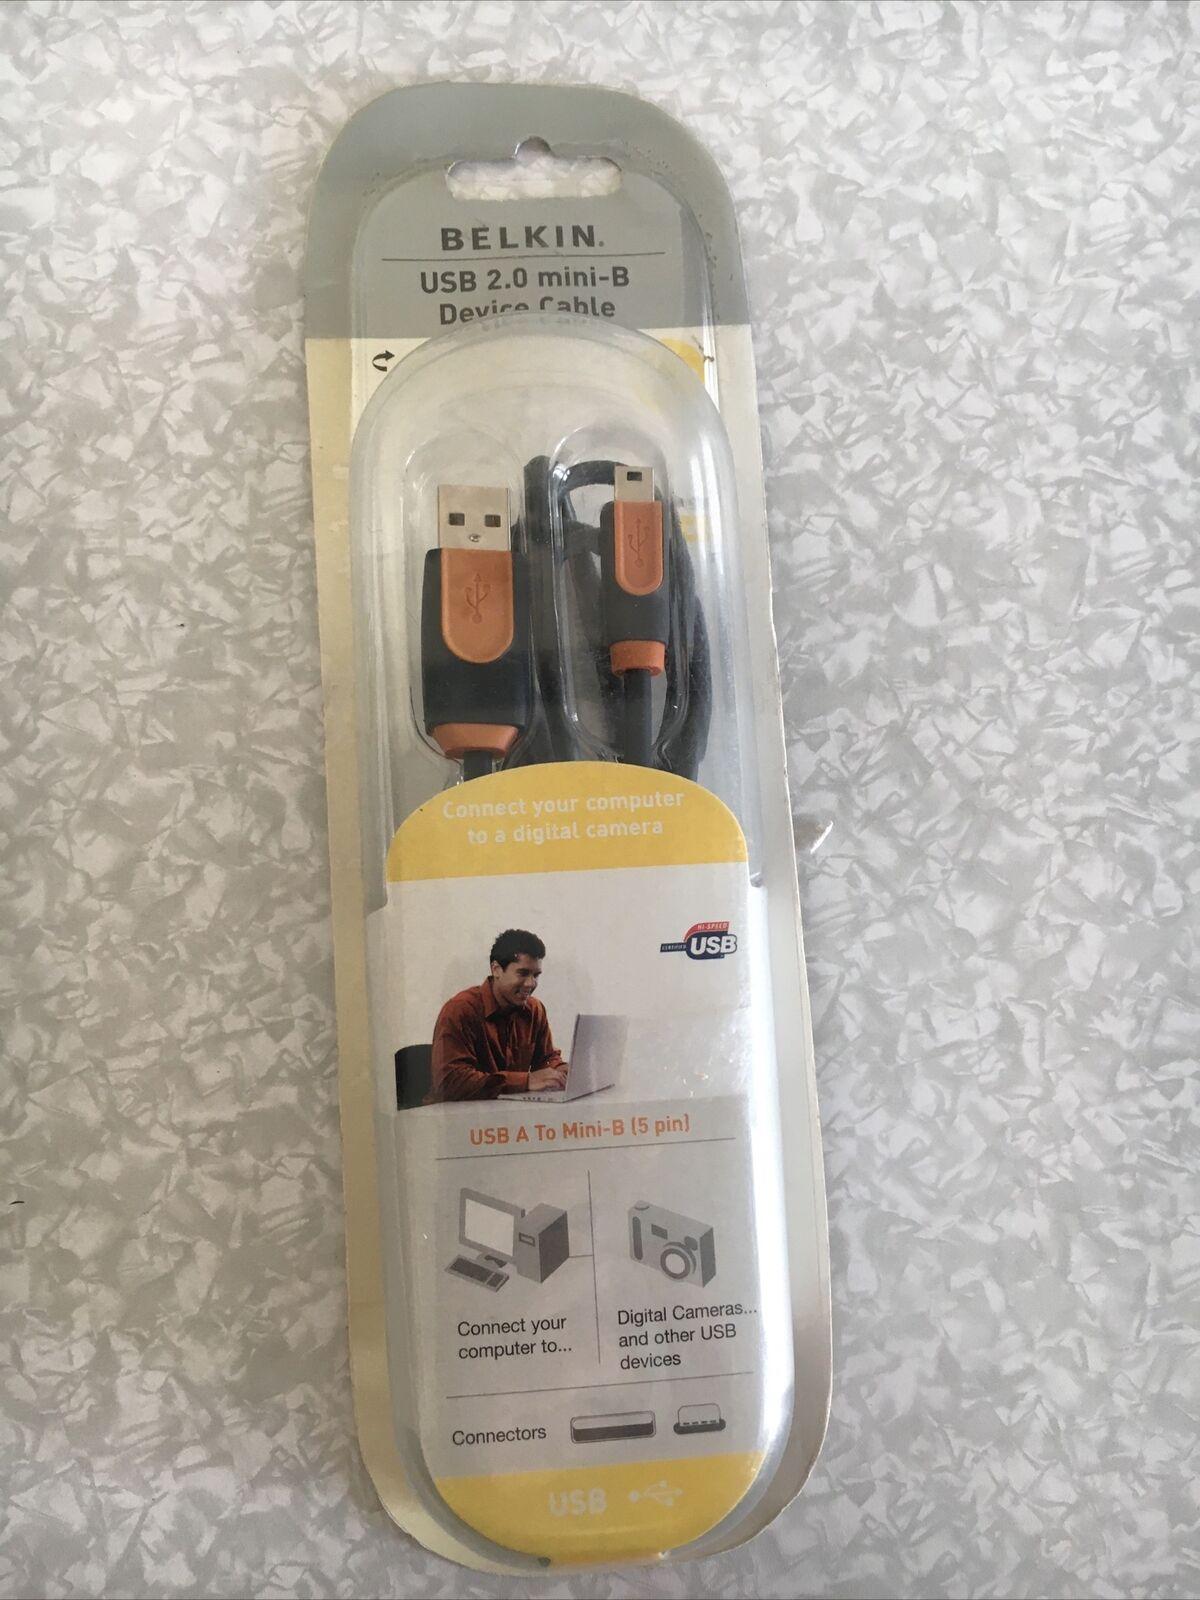 Belkin USB 2.0 Mini-B Device Cable